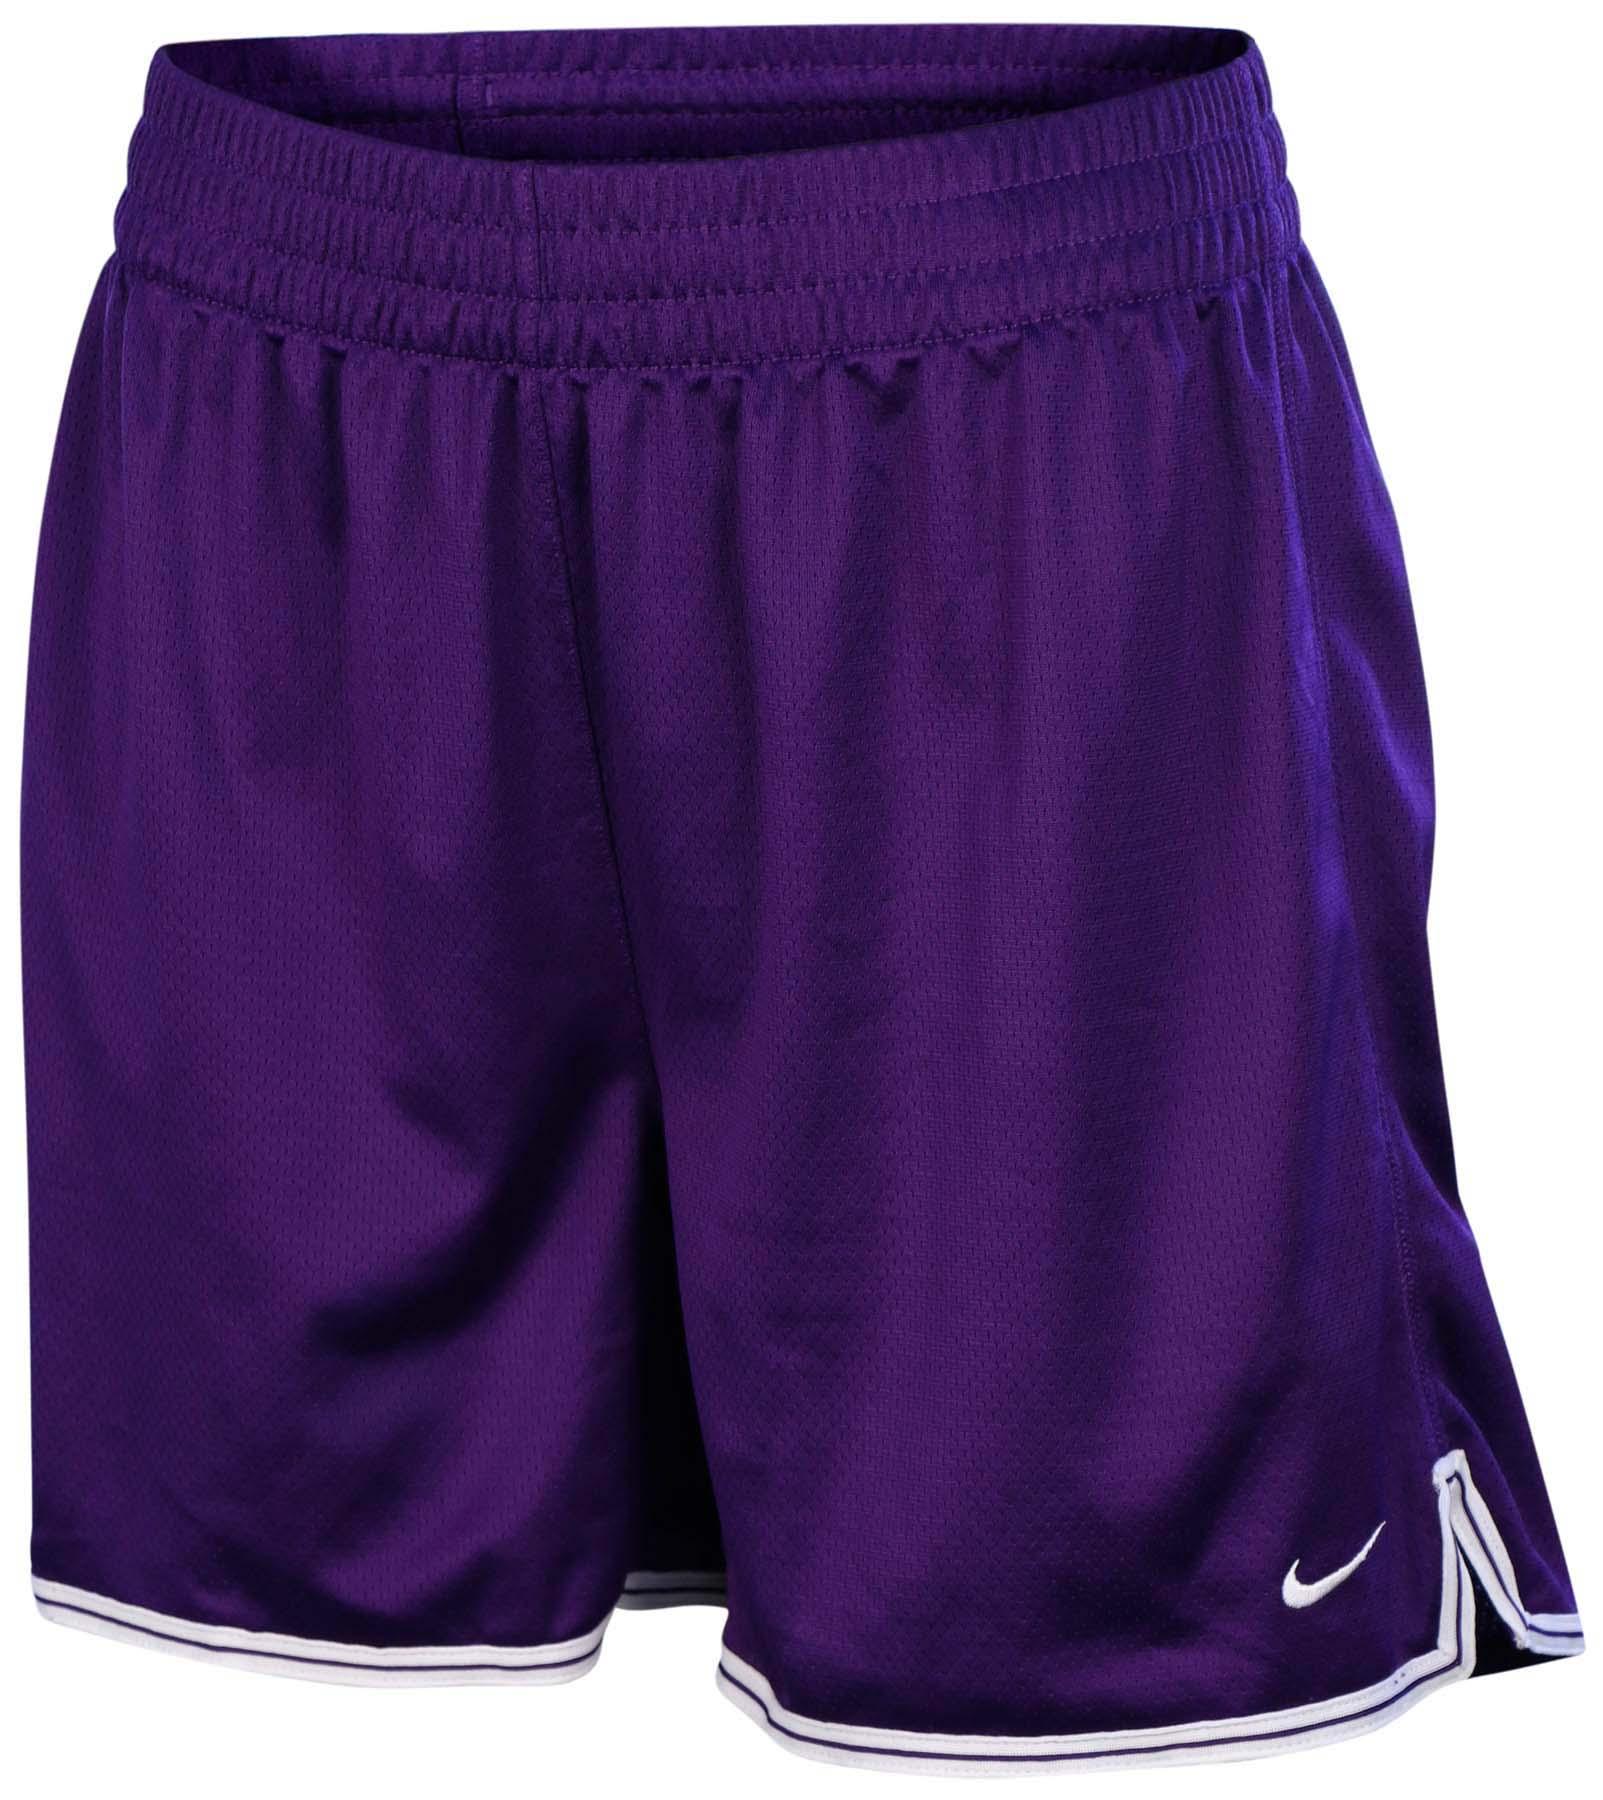 Creative Nike Women39s Legend 20 Tight DriFit Pants GraphiteBlue  EBay